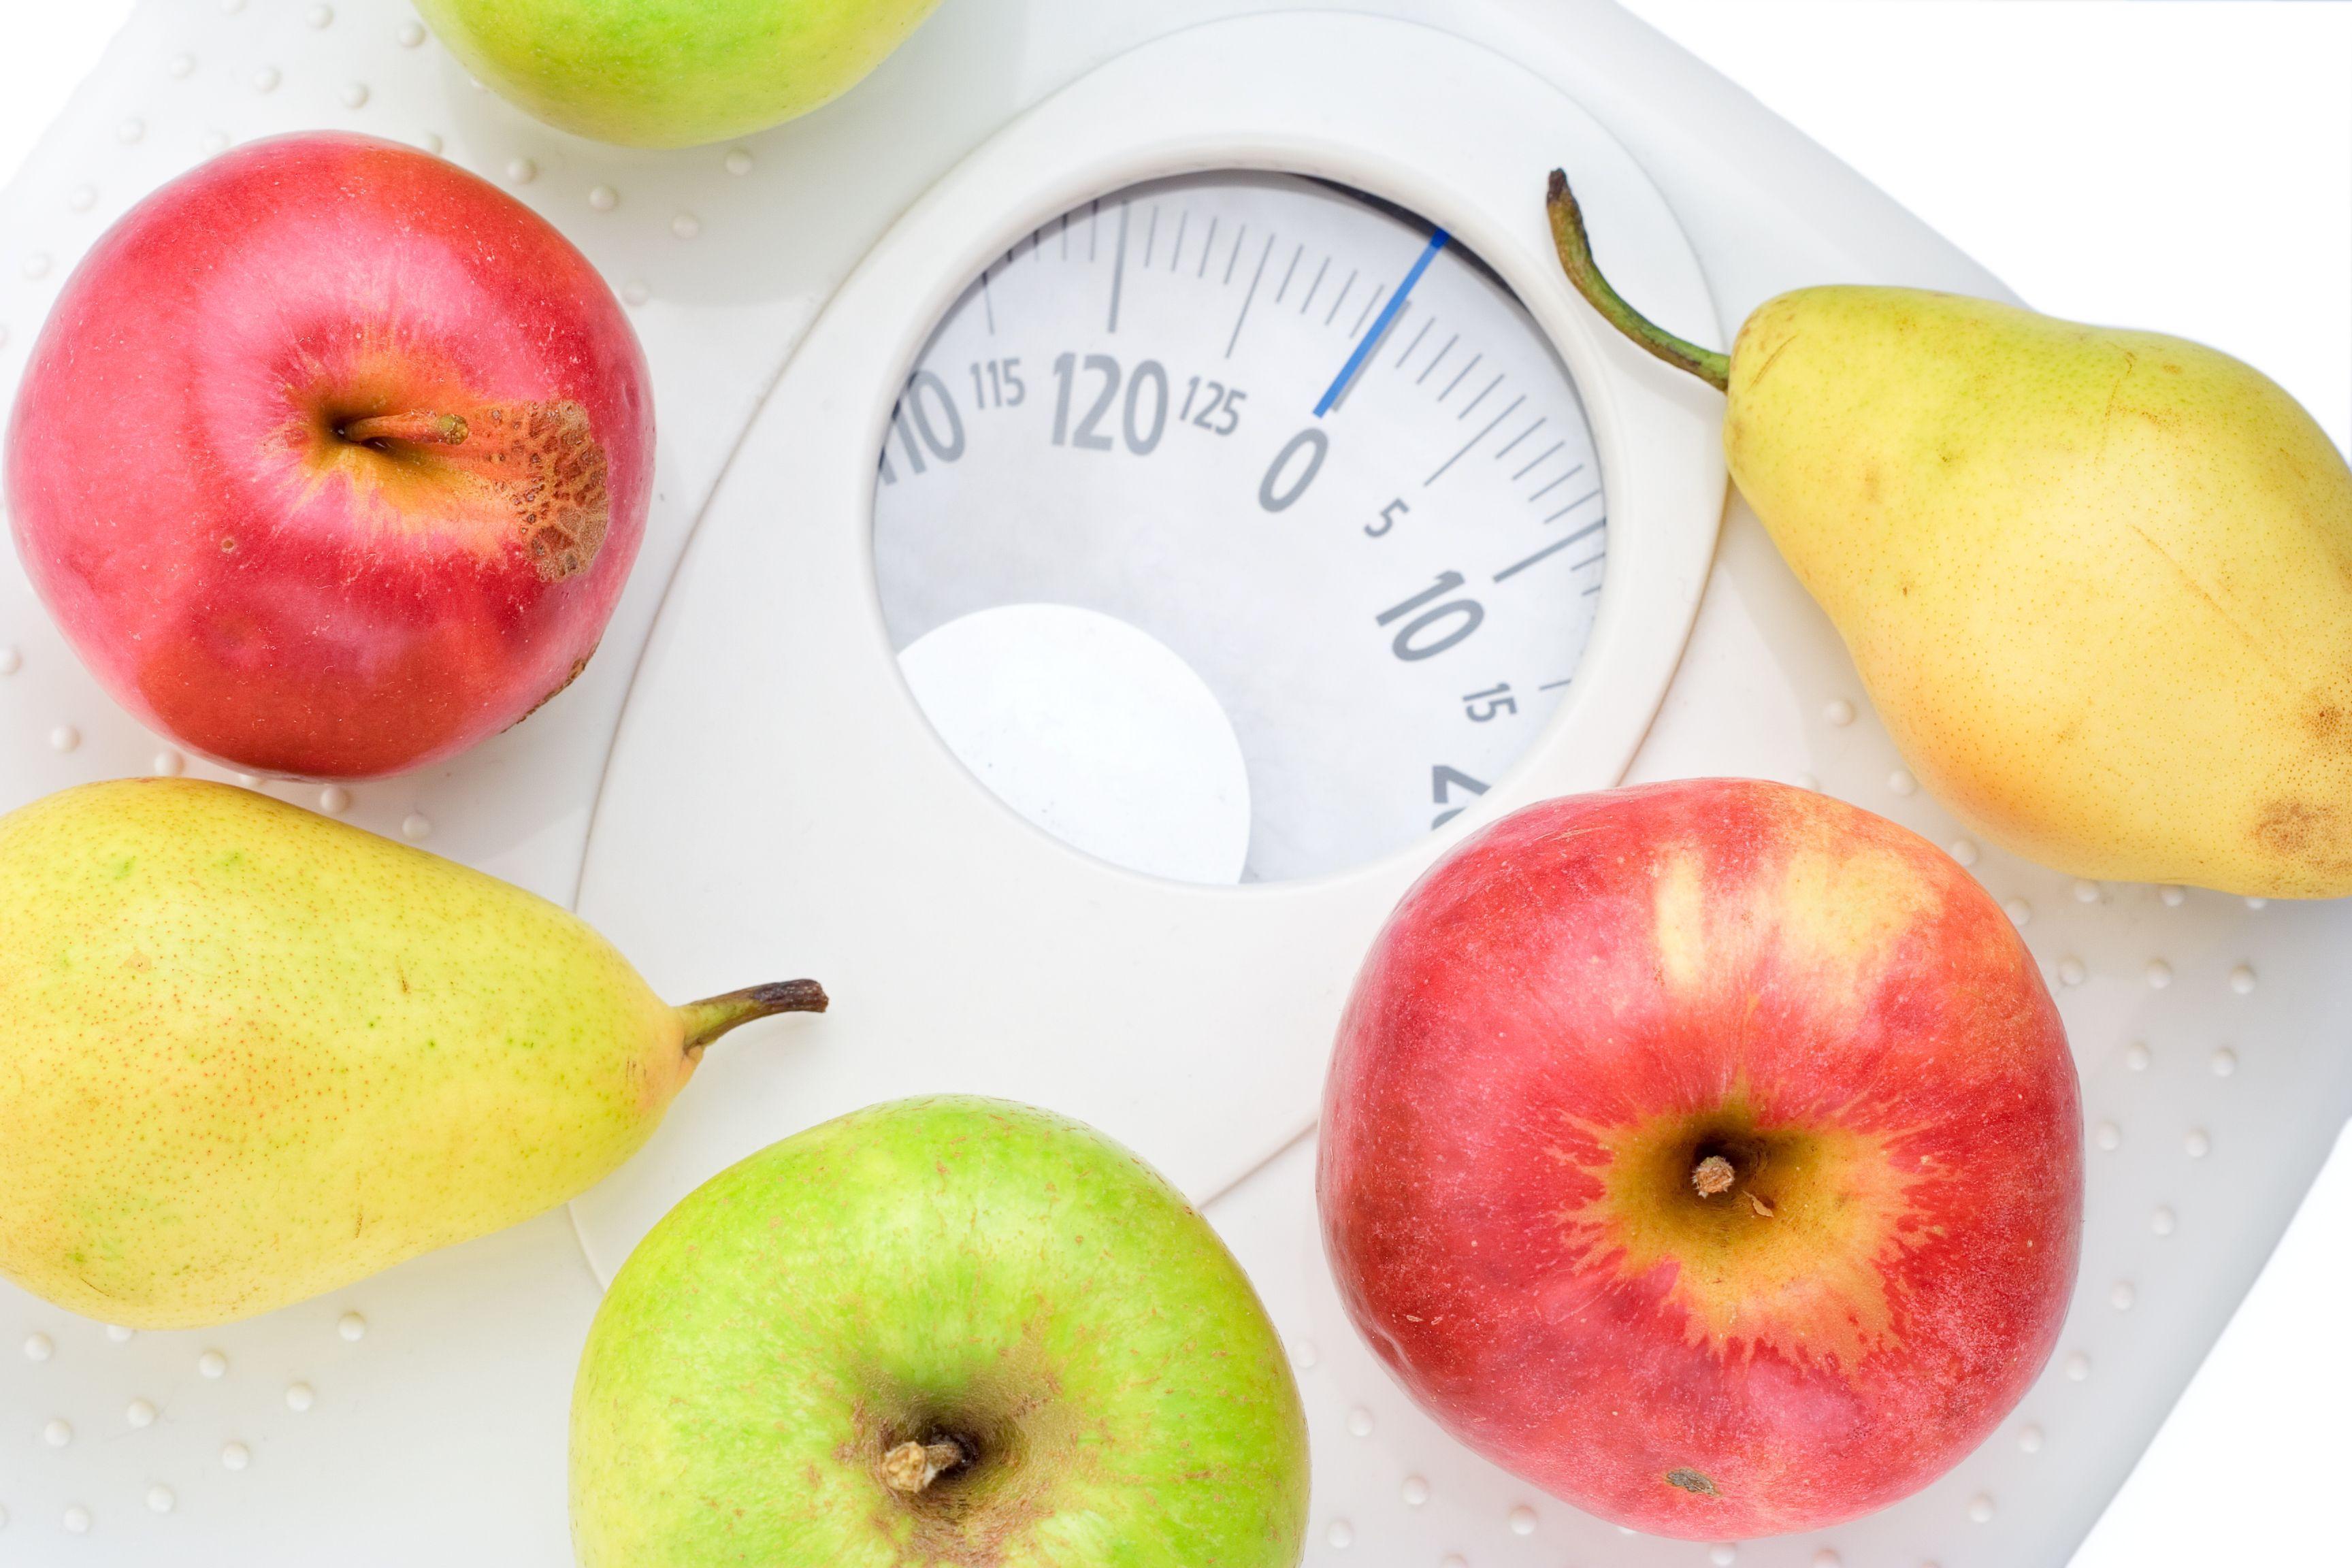 Dieta Rápida e Curta Para Perder Peso